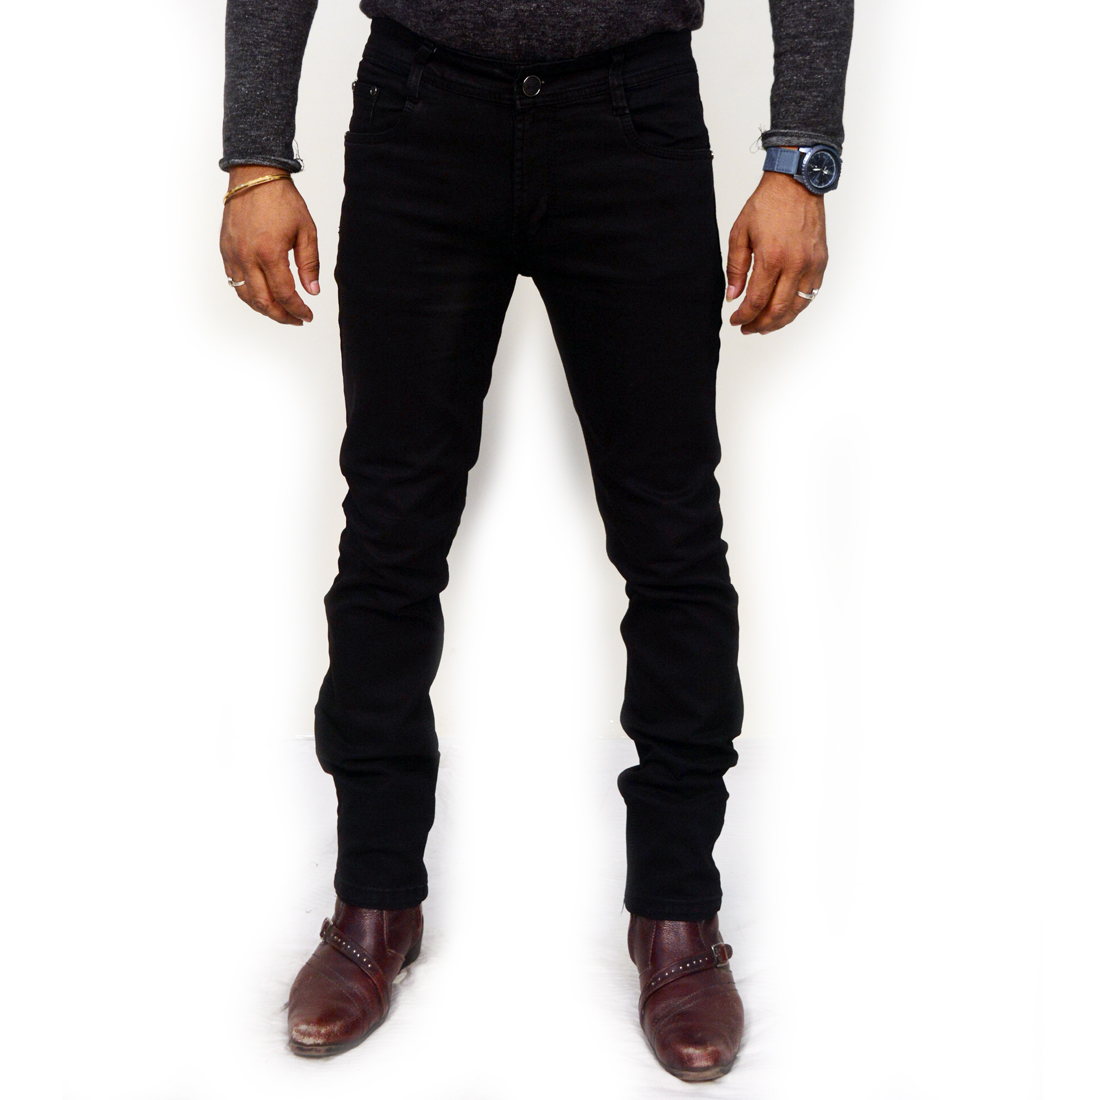 T&Y Men's Denim pants Black